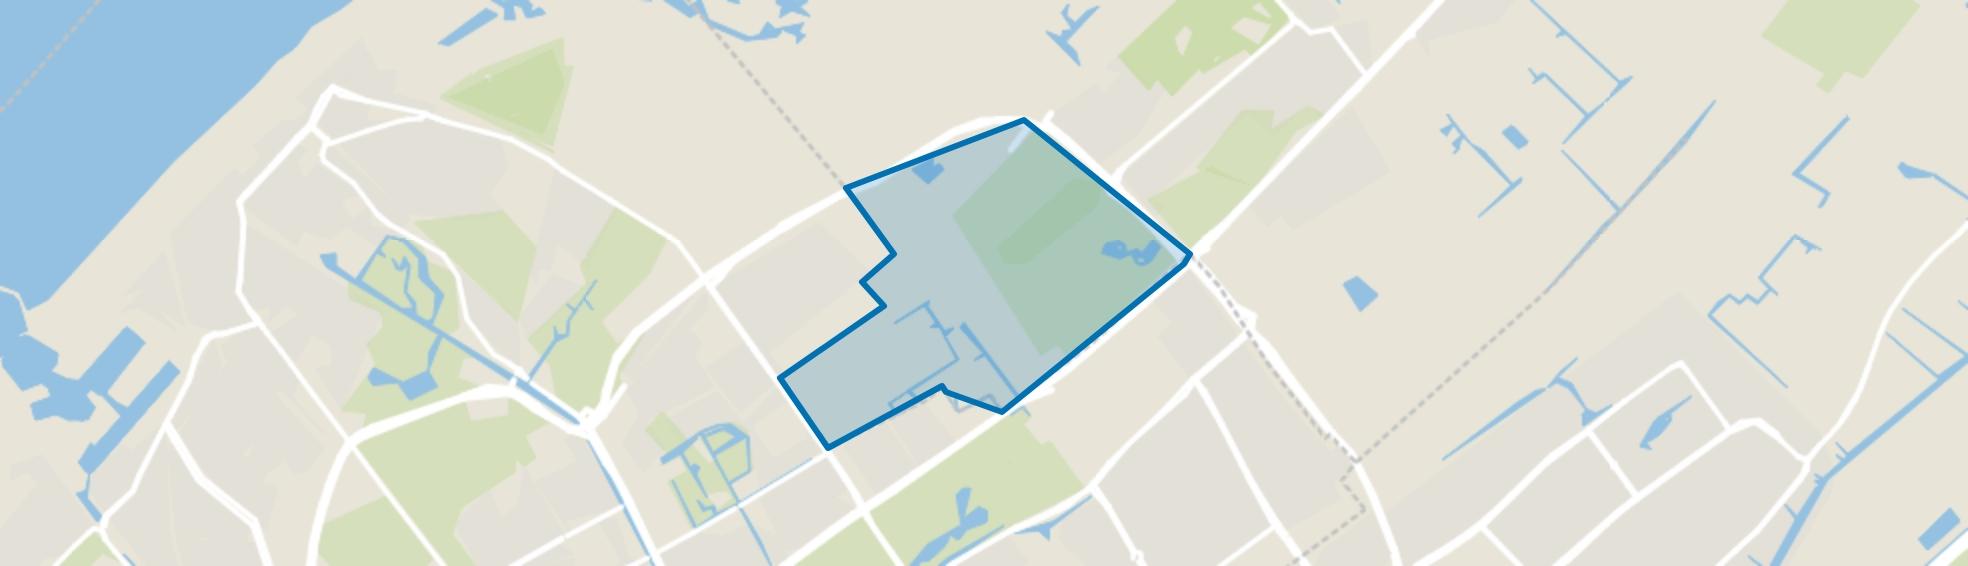 Duindigt met Groenendaal, Wassenaar map